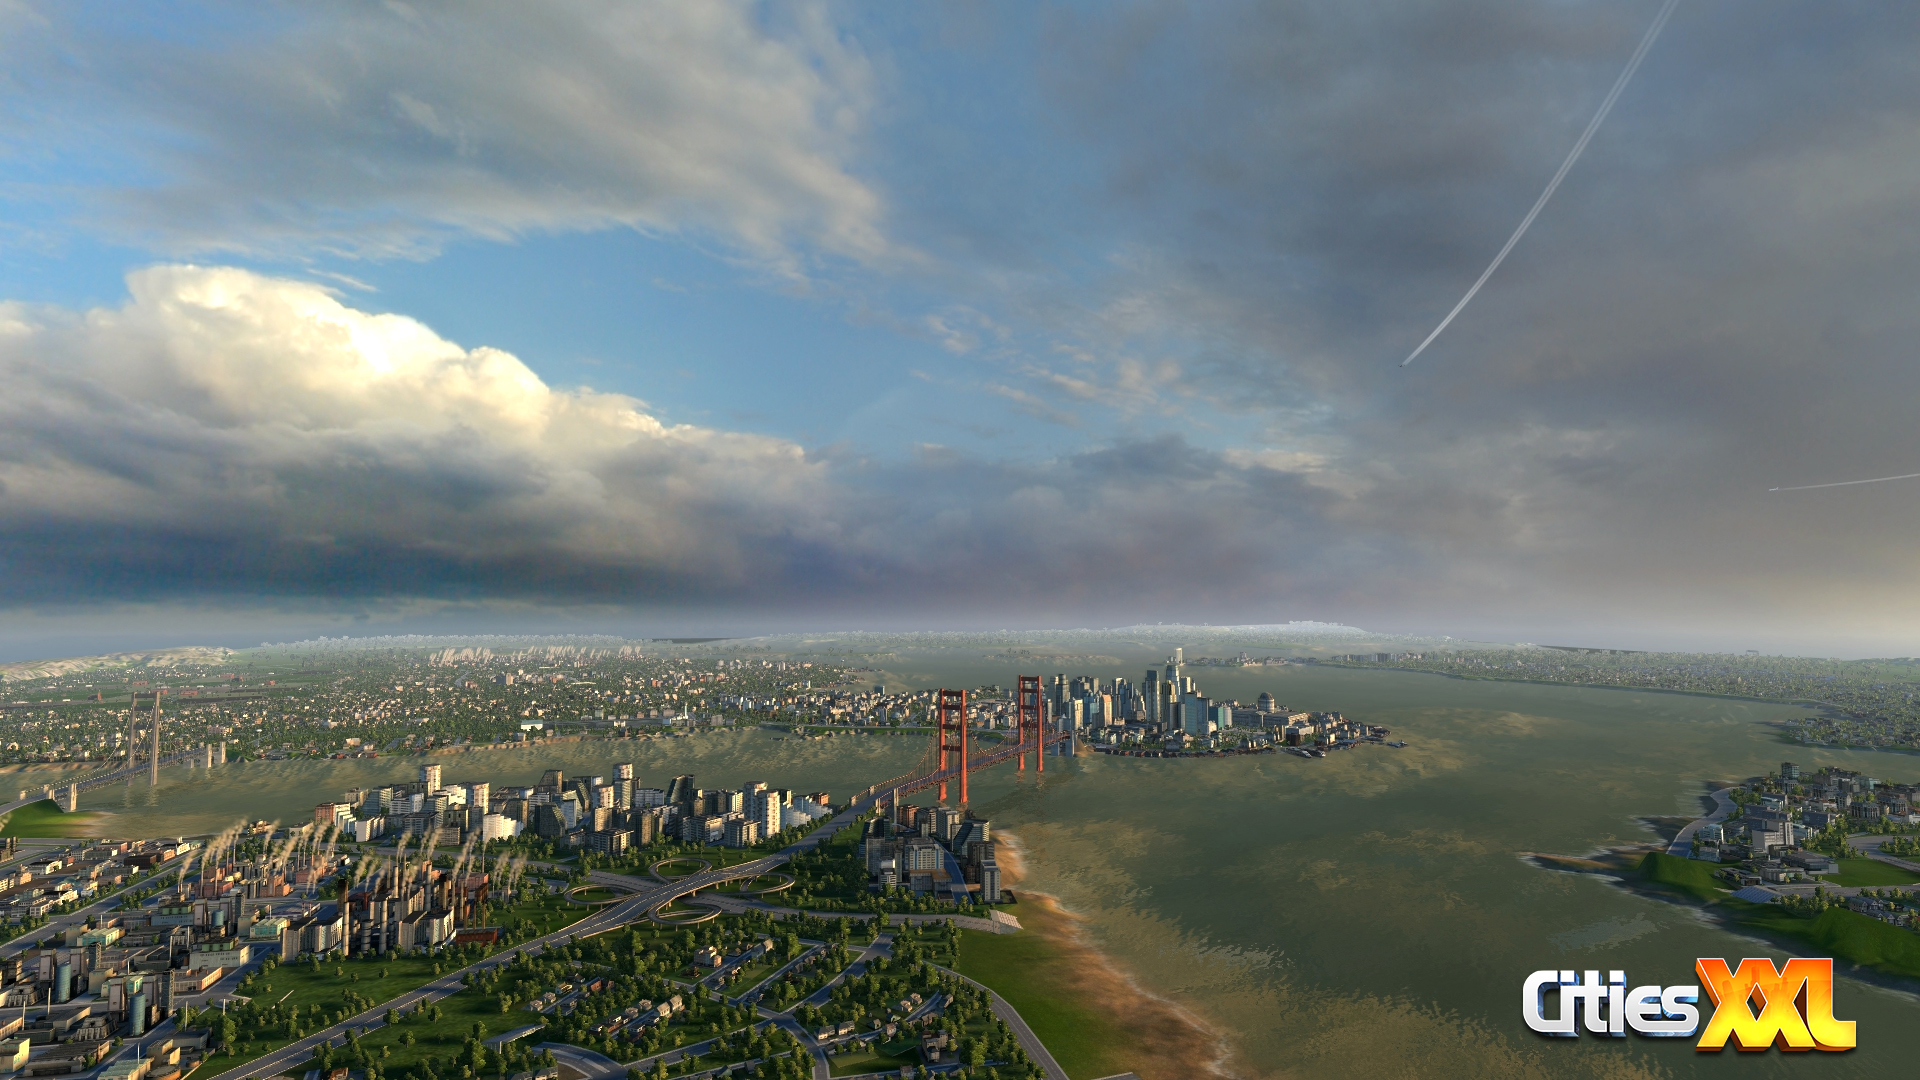 Cities XXL (3)